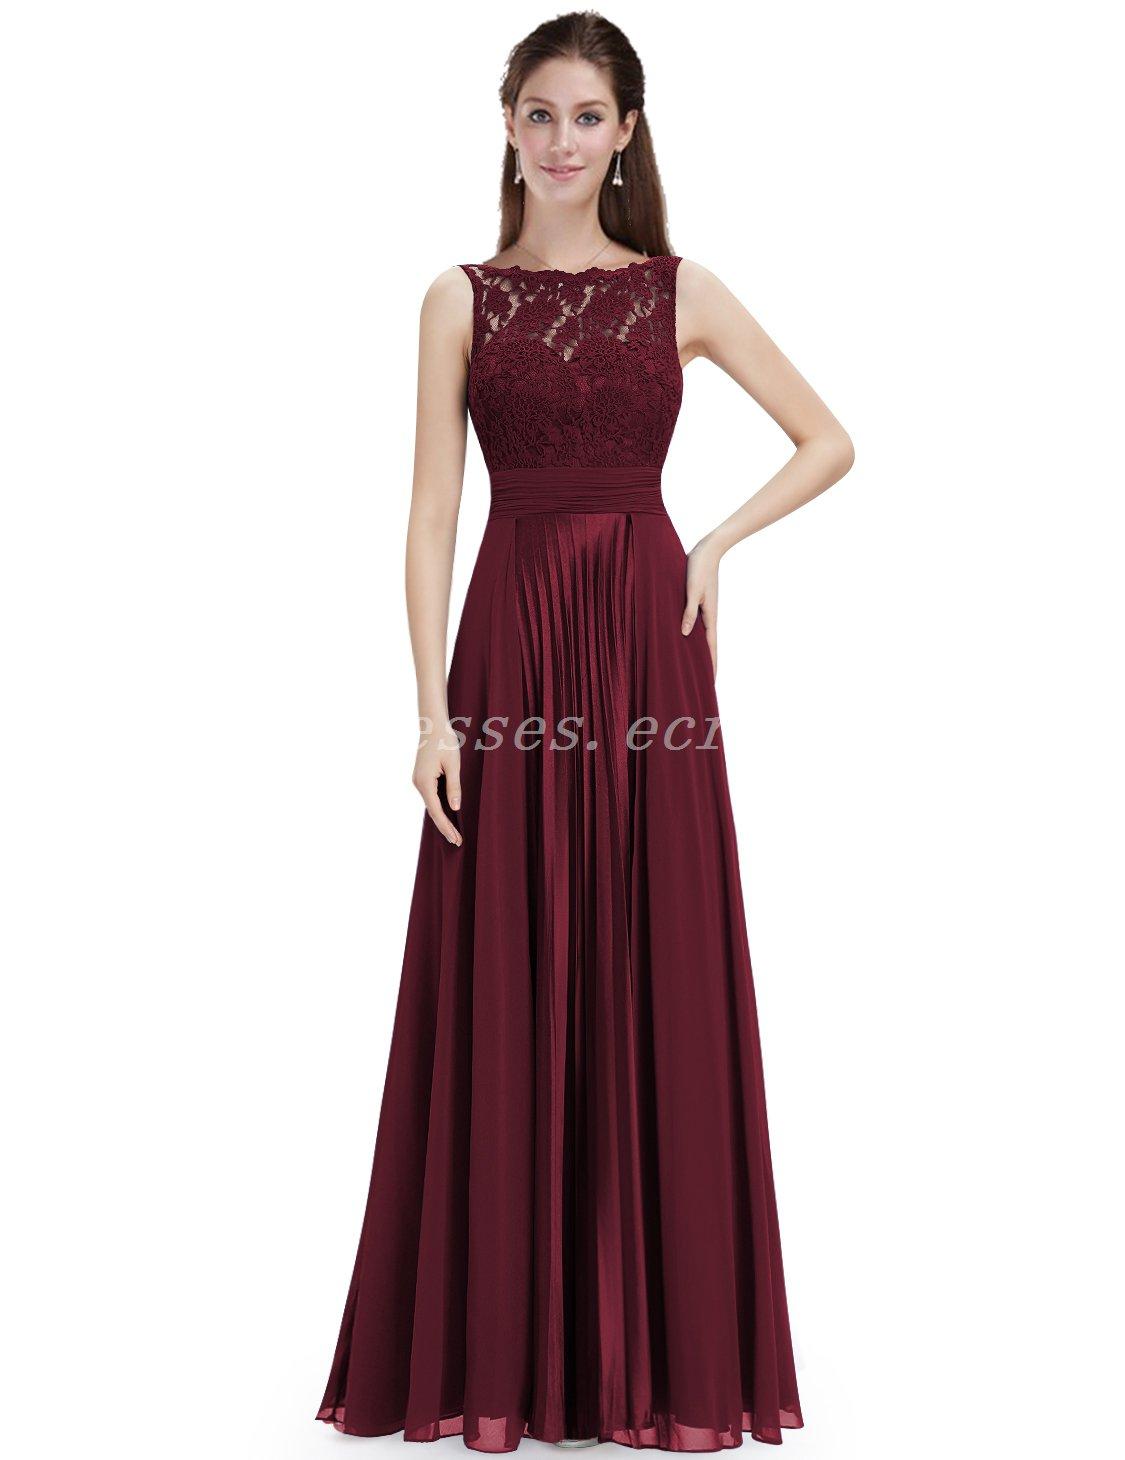 Boat Neckline Chiffon Burgundy Bridesmaid Dresses With Lace